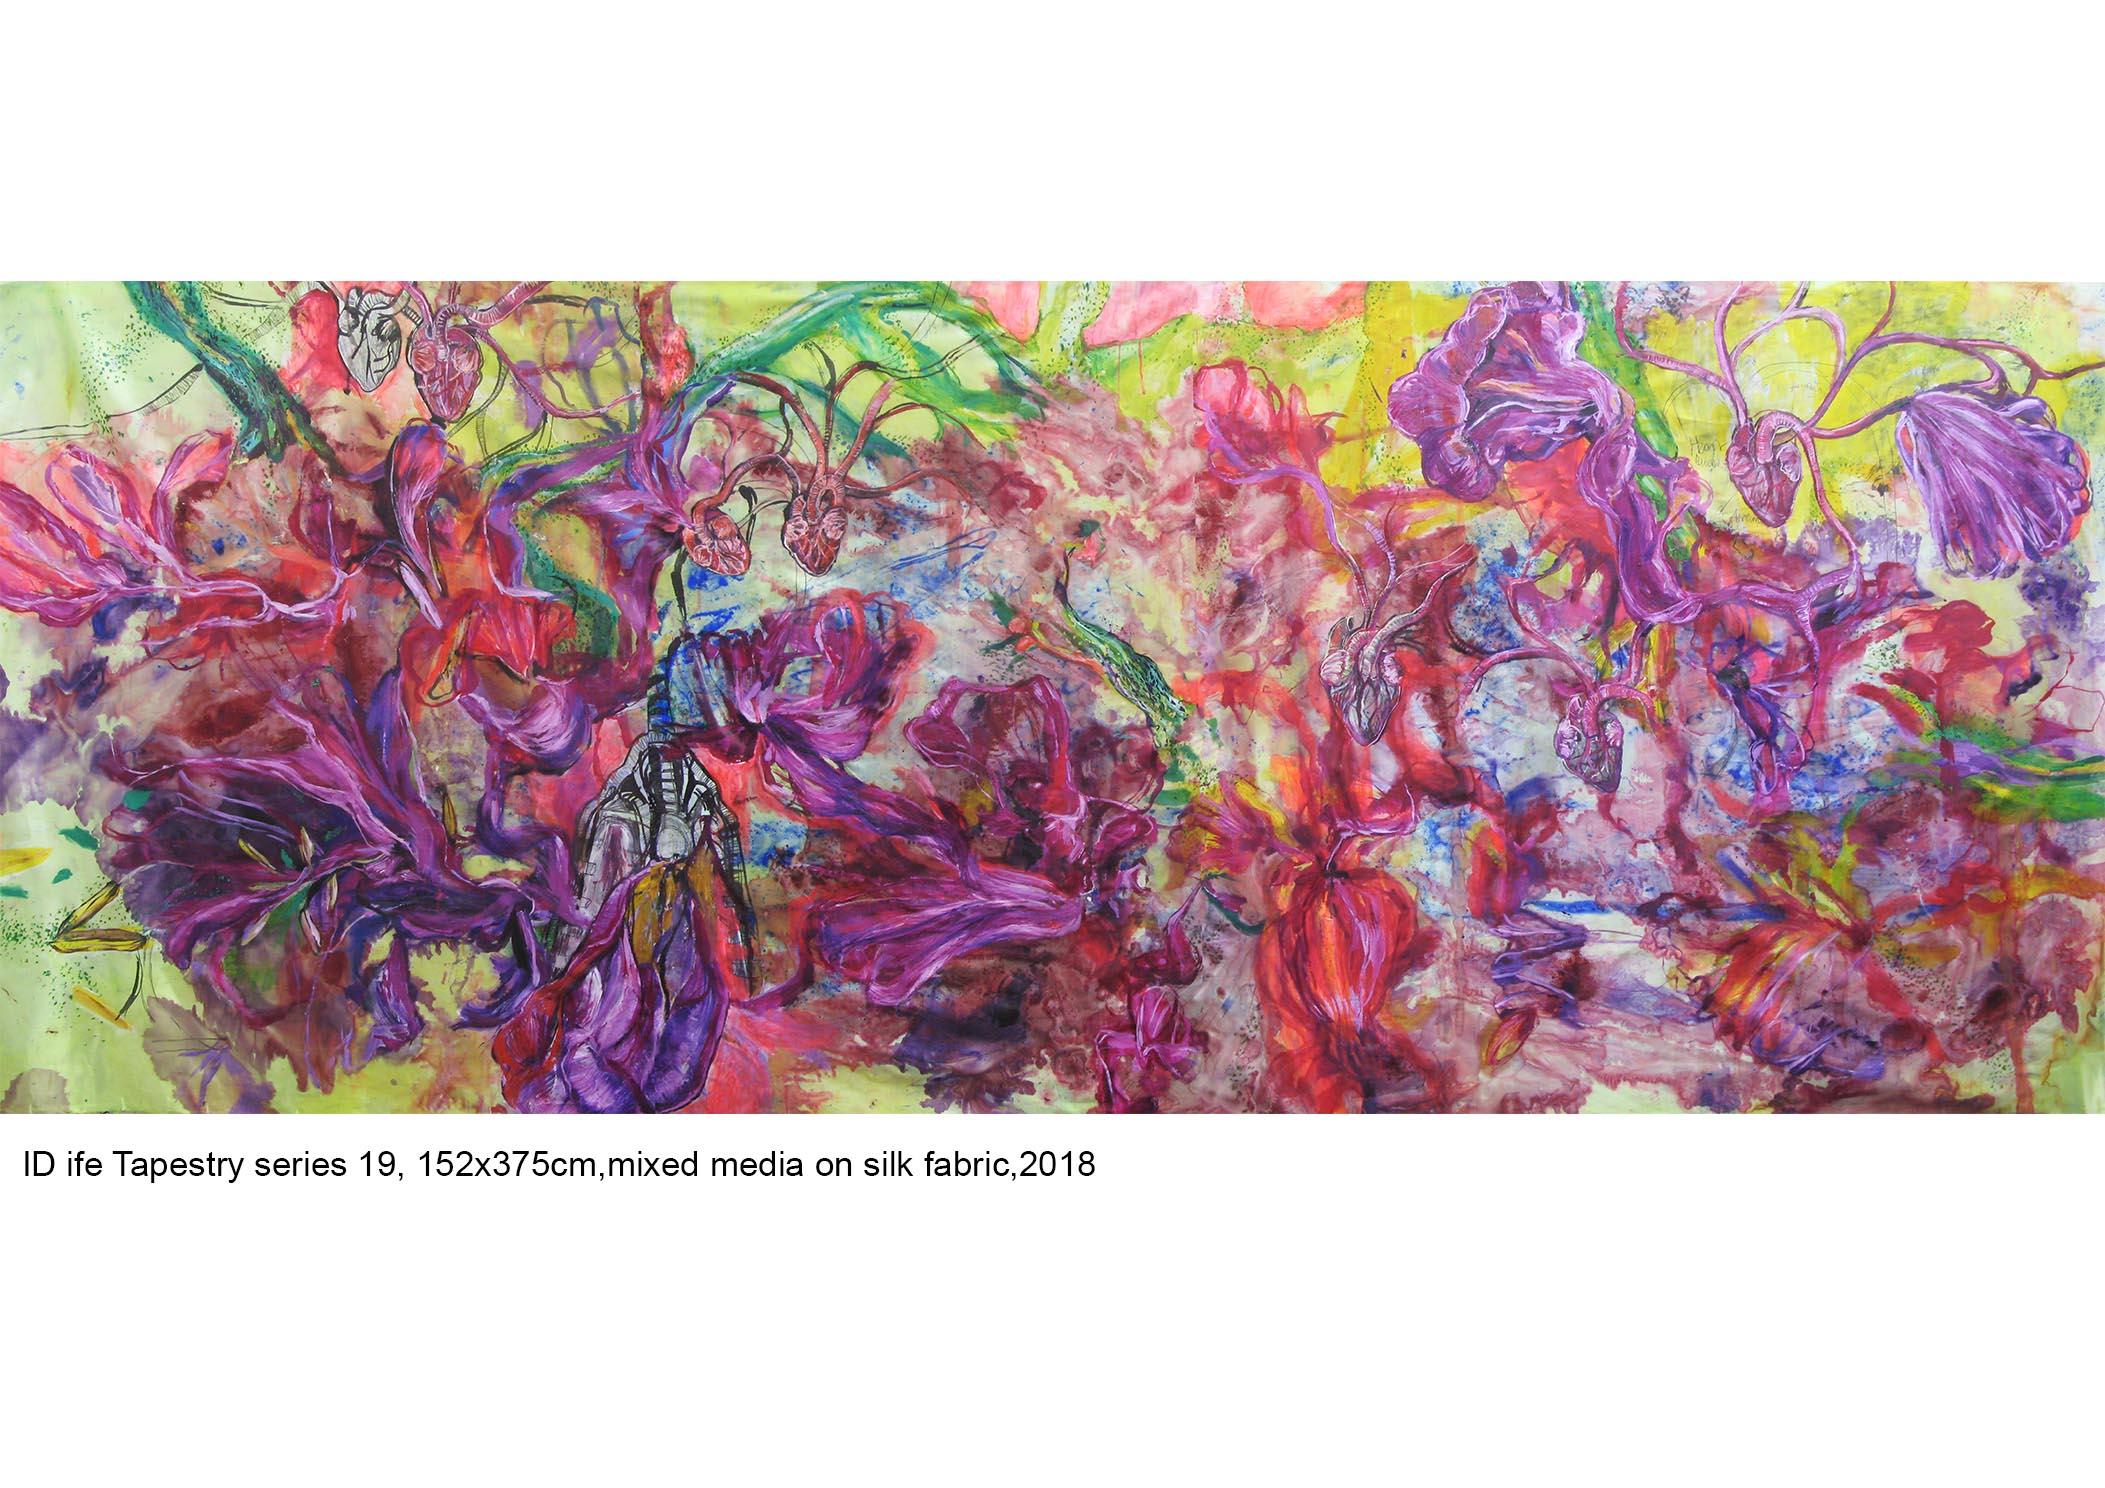 Id Life Tapestry, mixed media on silk fabric, 152x375cm, 2018-19